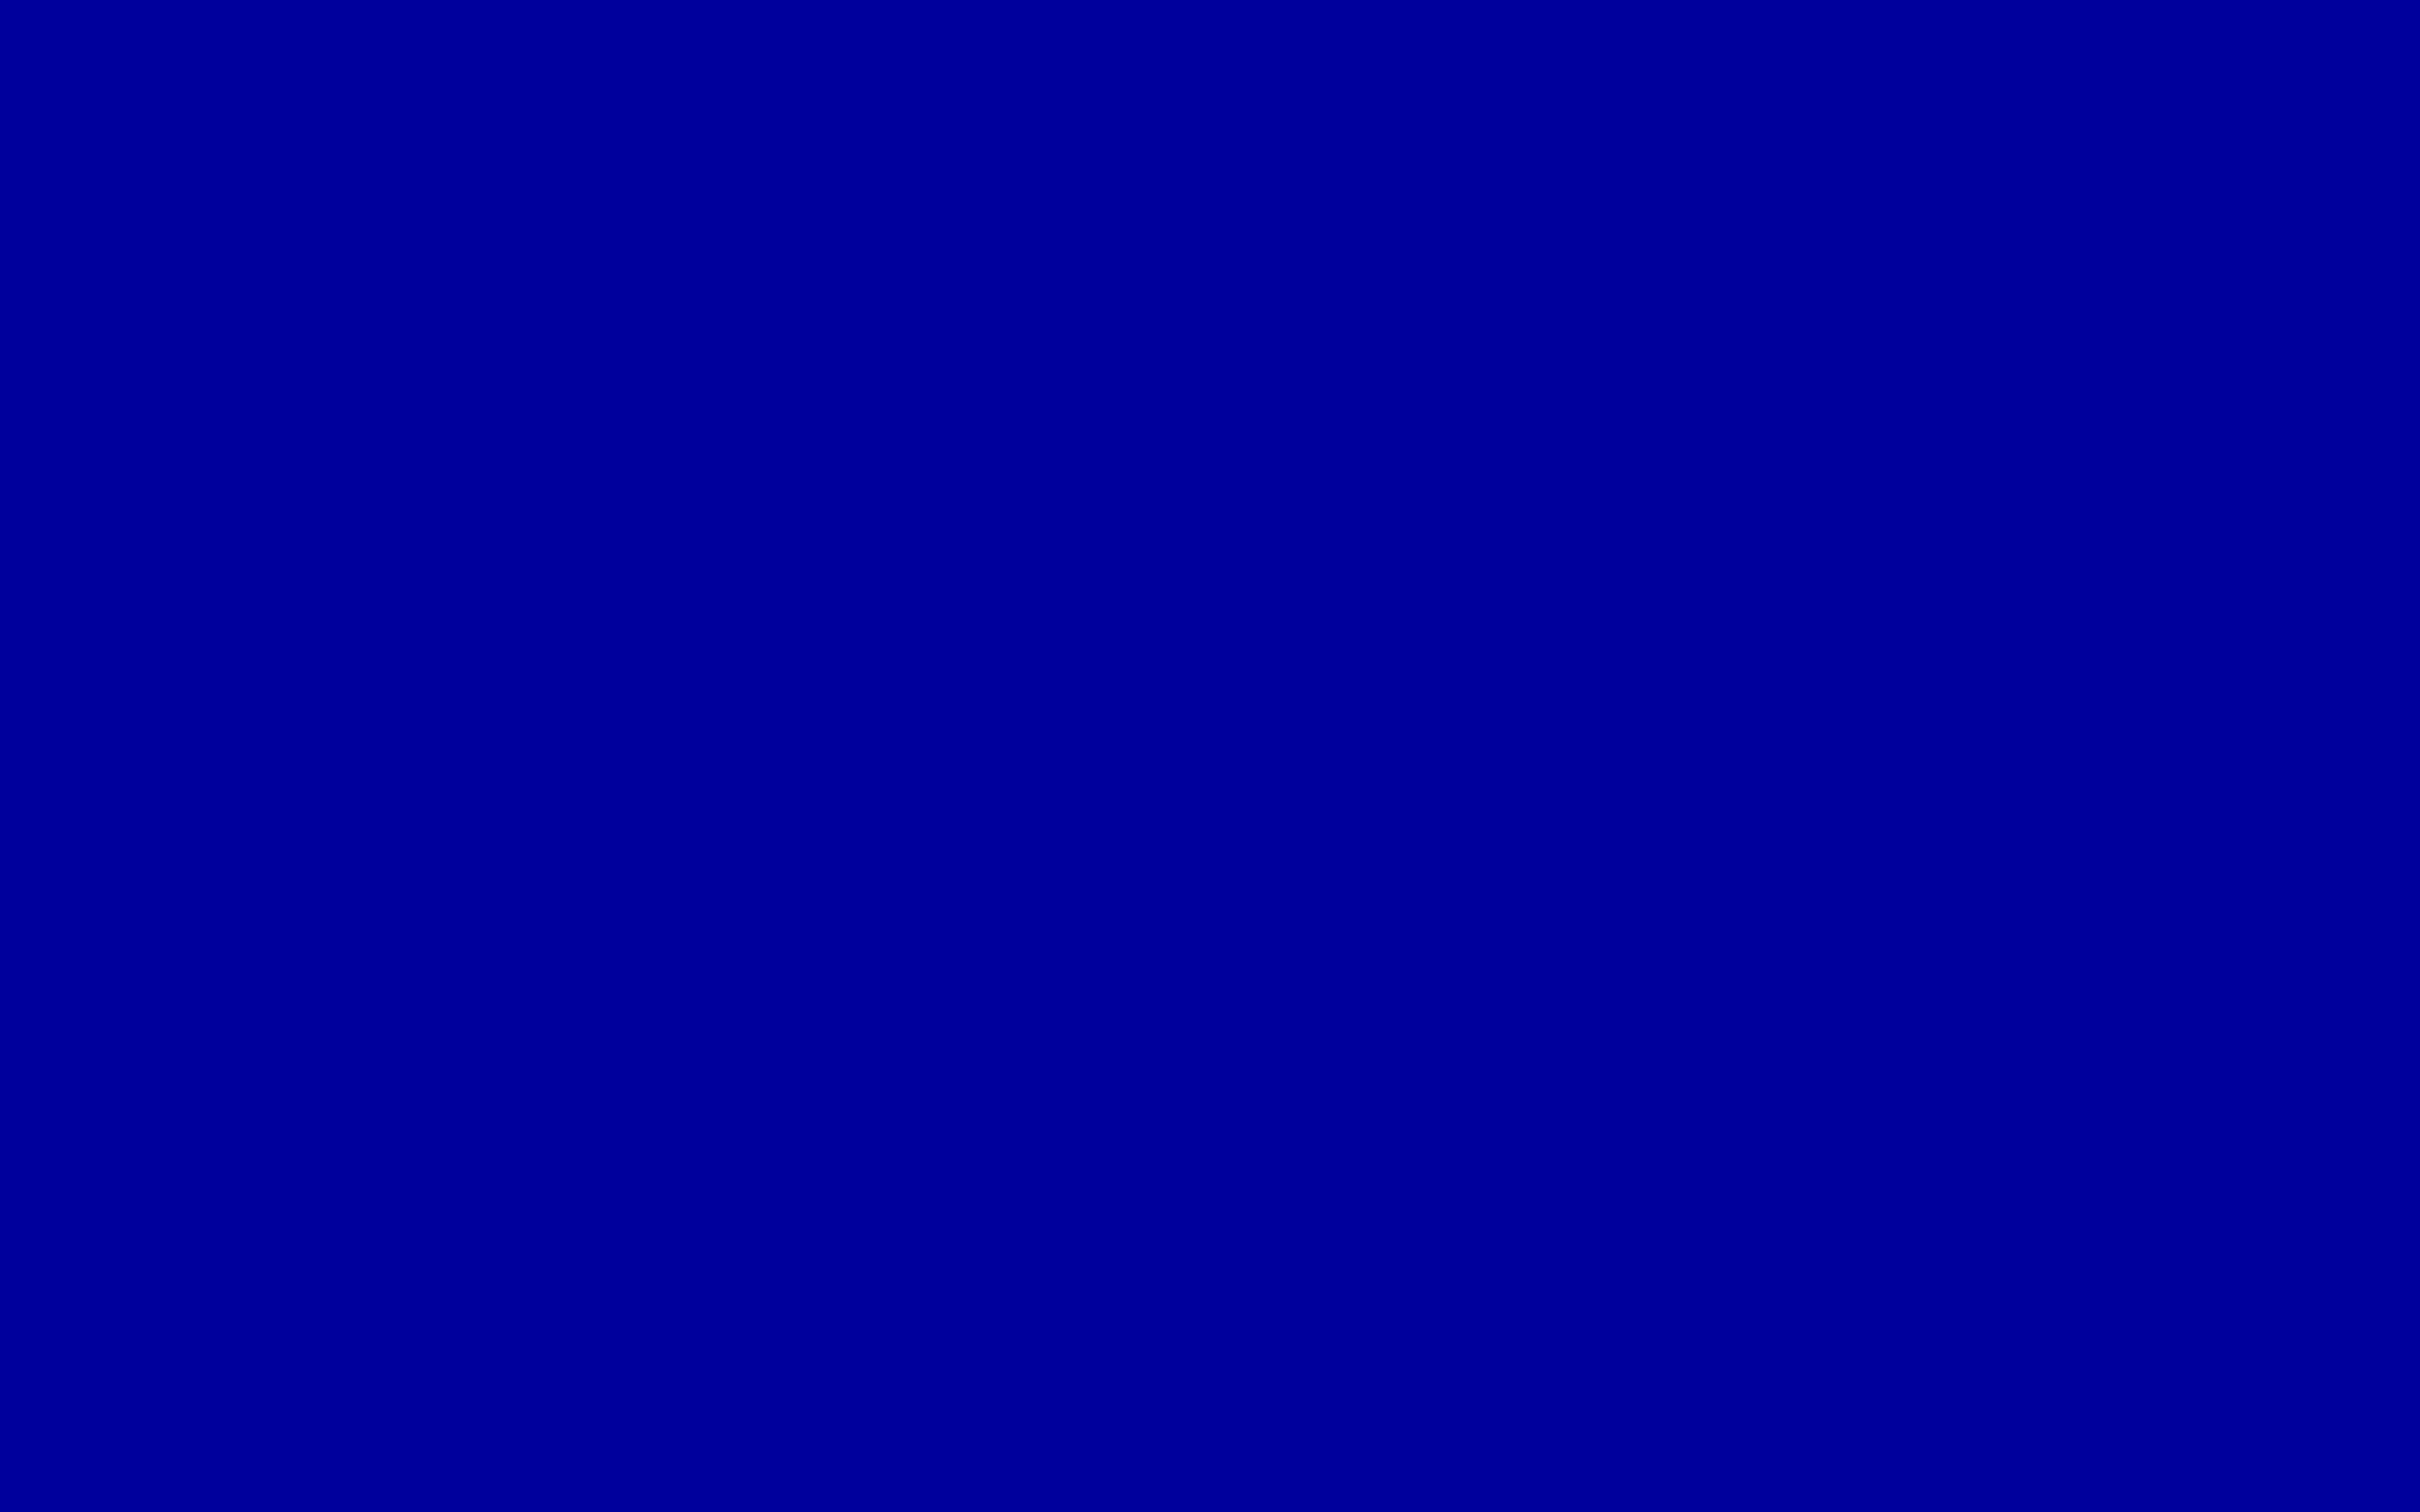 2560x1600 Duke Blue Solid Color Background